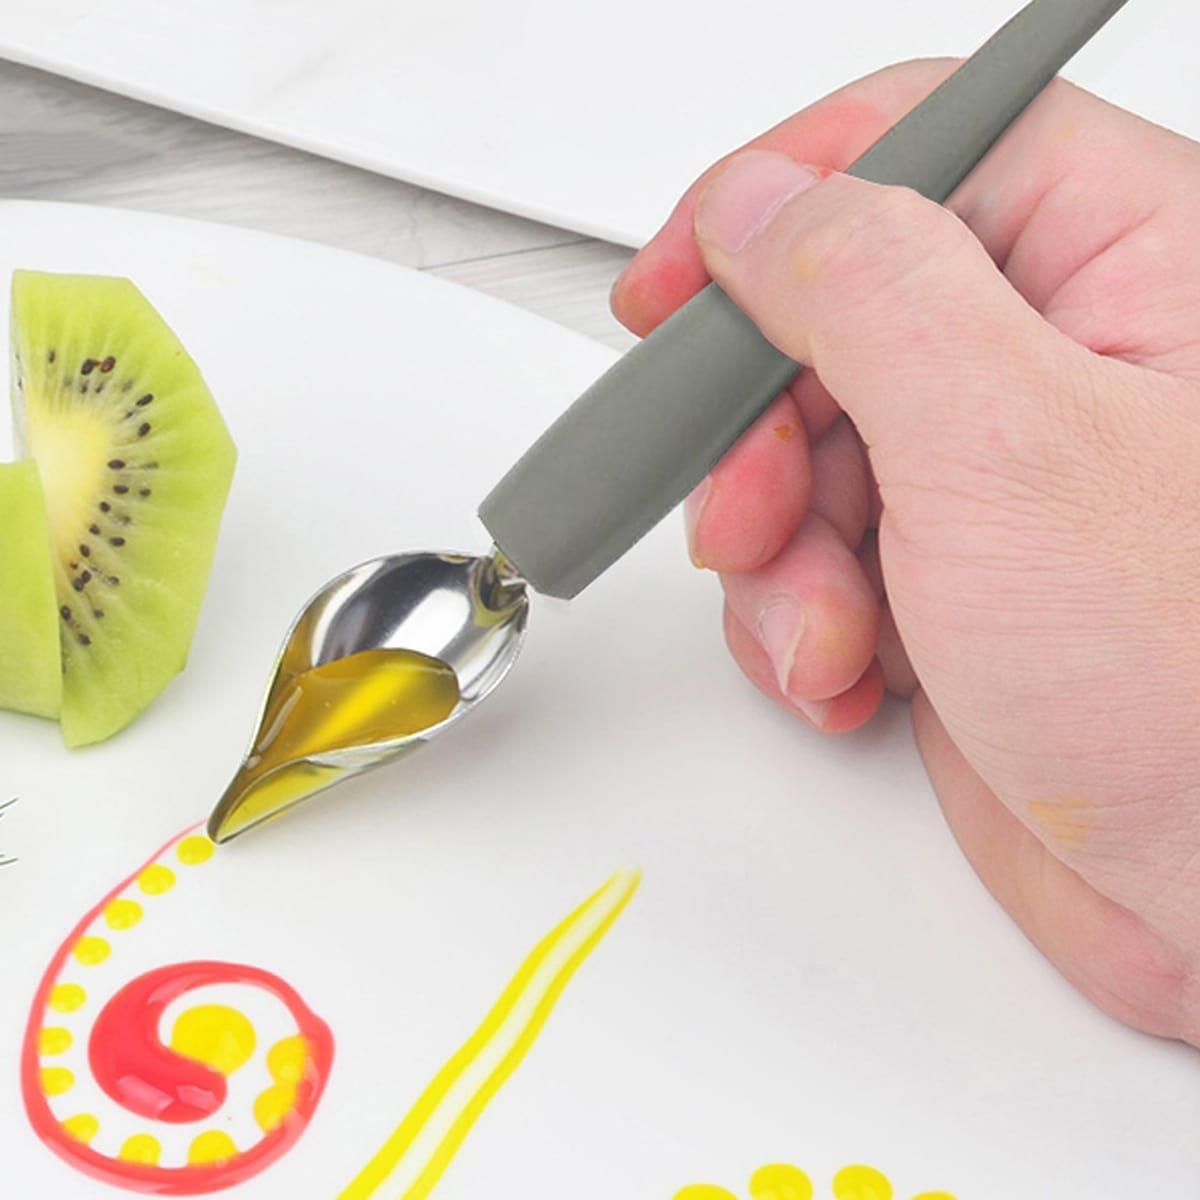 SHEIN / 1pc Fountain Pen Design Sauce Spoon